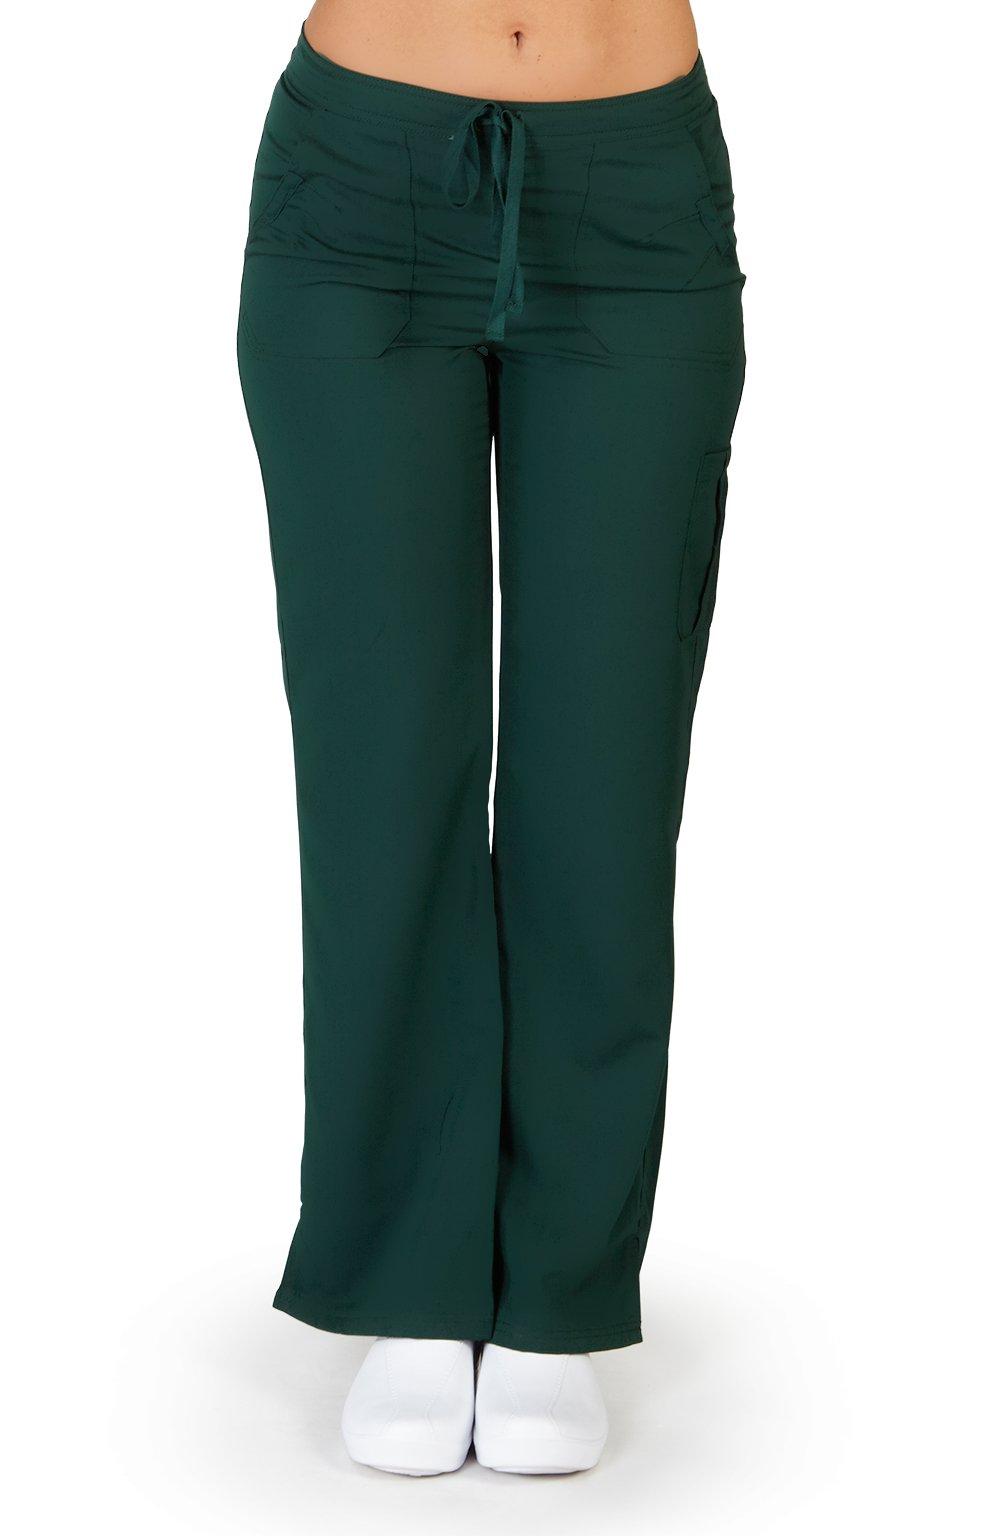 Ultra Soft Brand Scrubs - Premium Womens Junior Fit Cargo Pocket Scrub Pant, Hunter 38490-Large